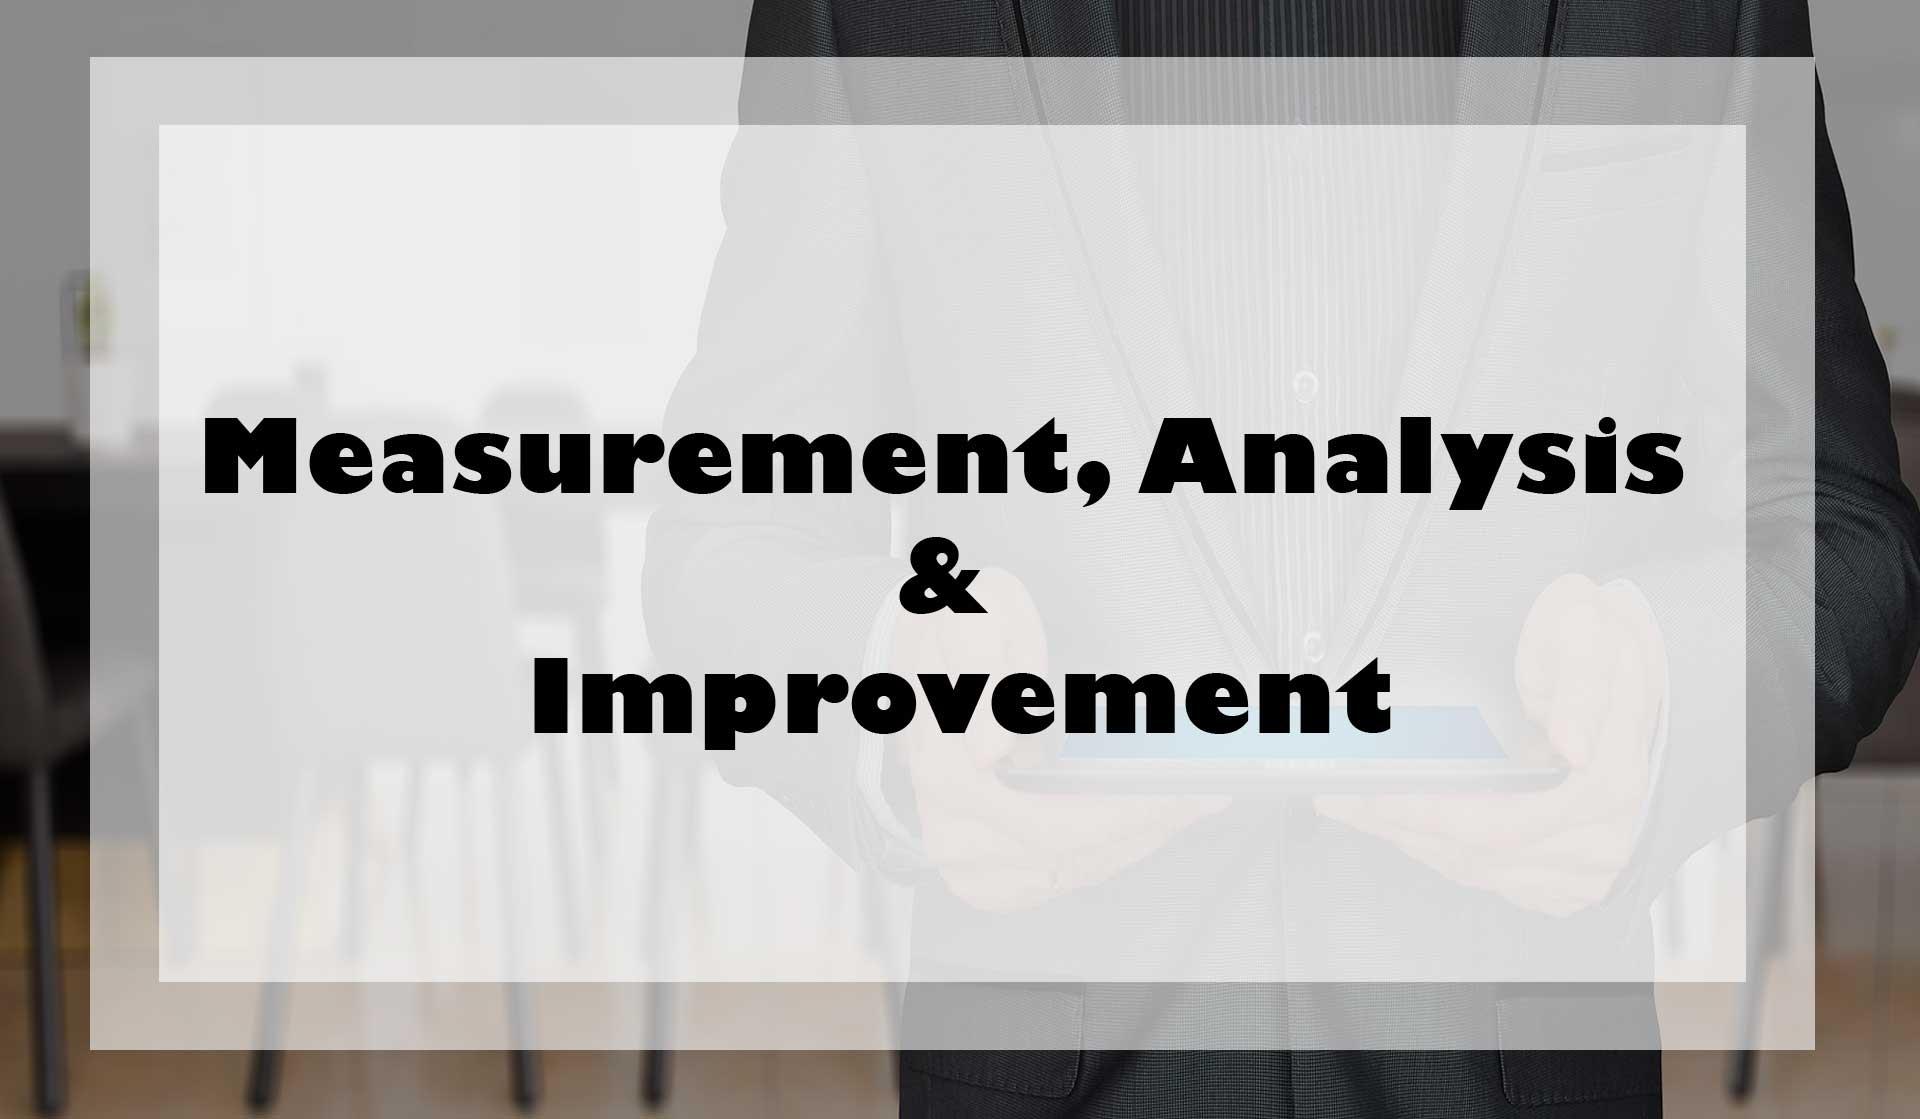 Measurement,Analysis_And_Improvement